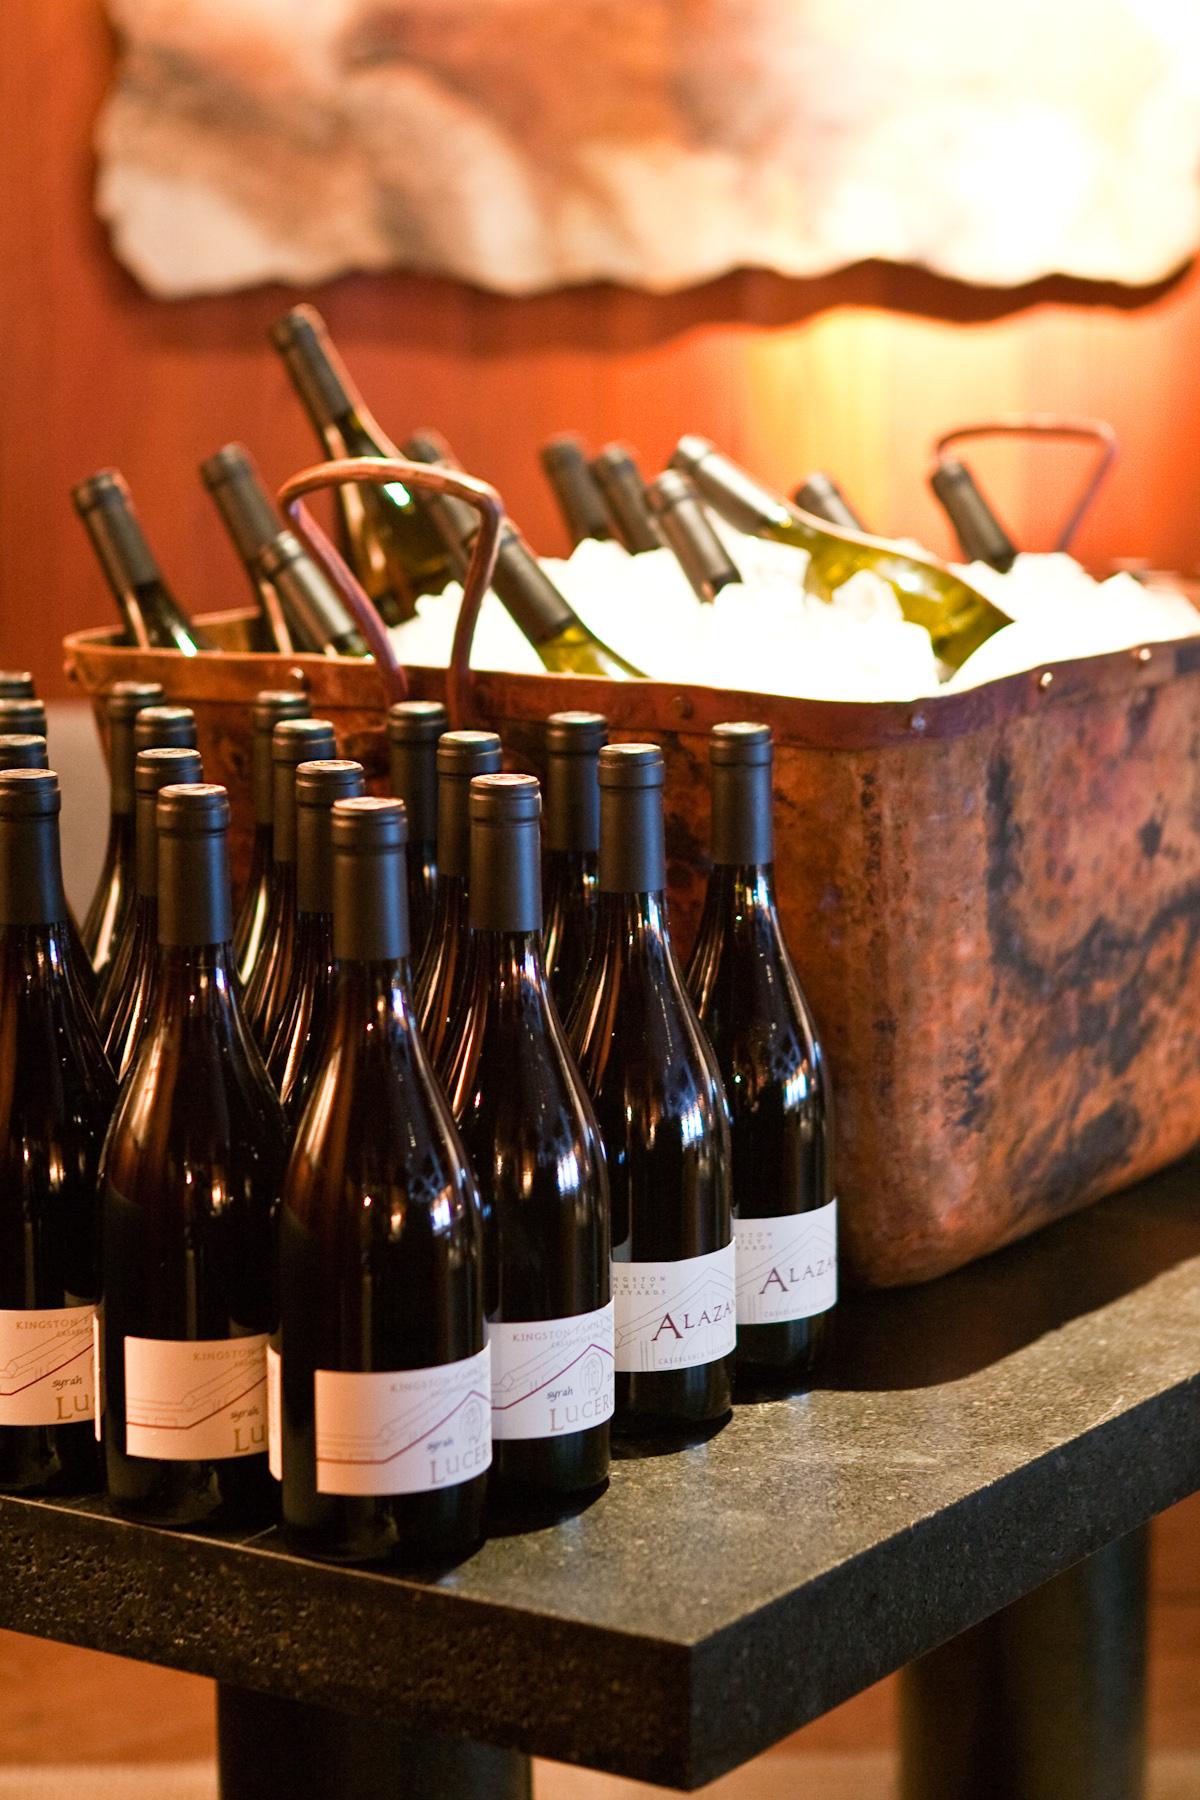 Kingston Family Vineyards - James Beard Syrah